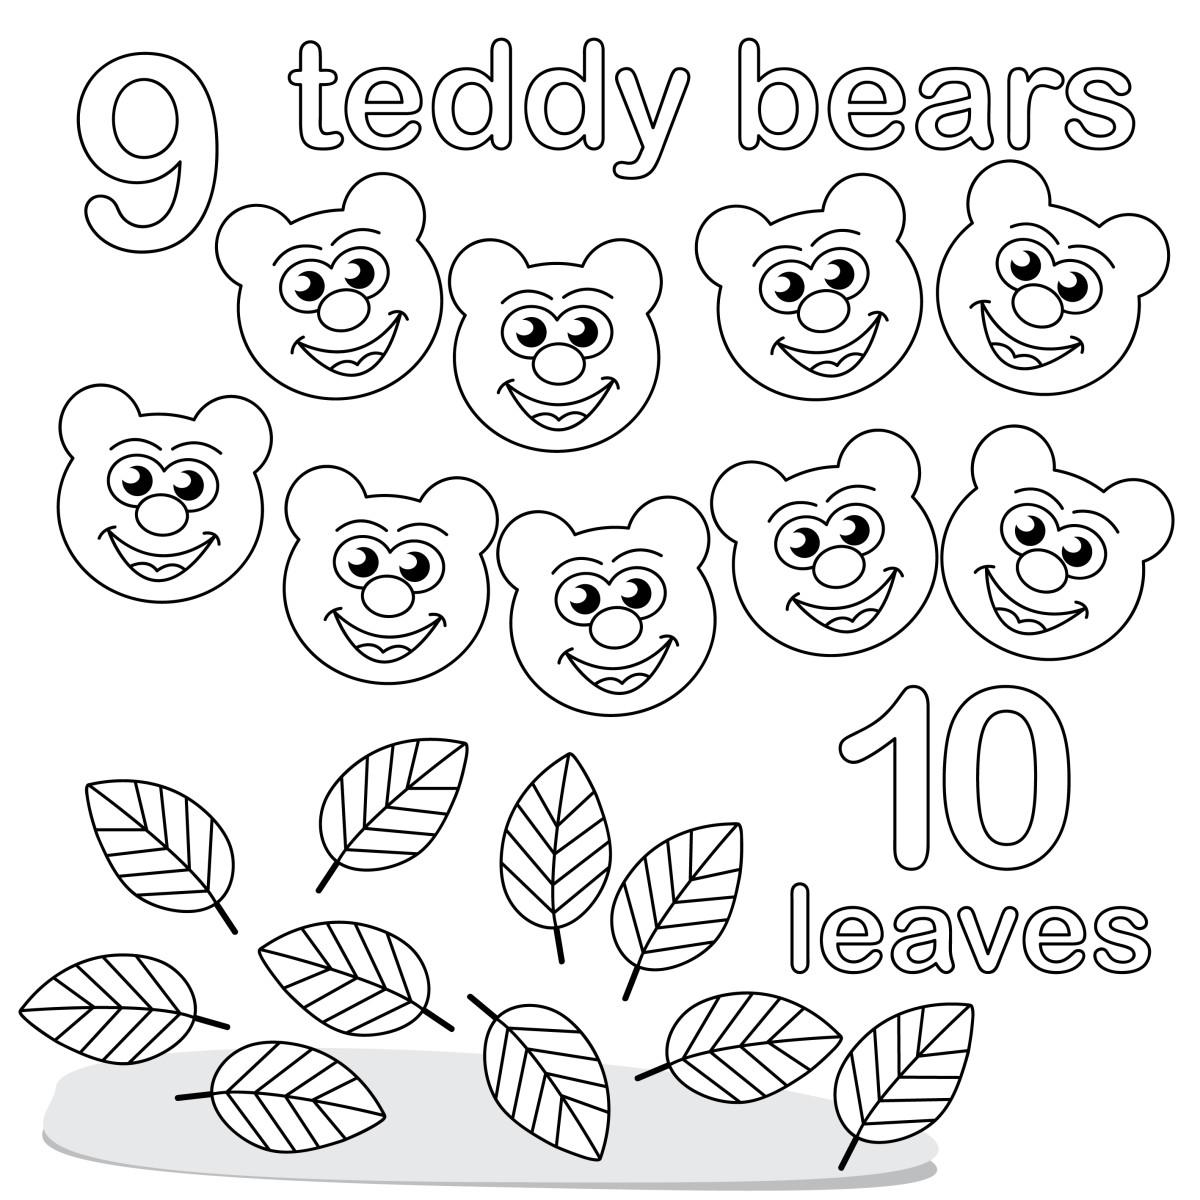 Учимся считать, цифра 9 и 10, медвежата